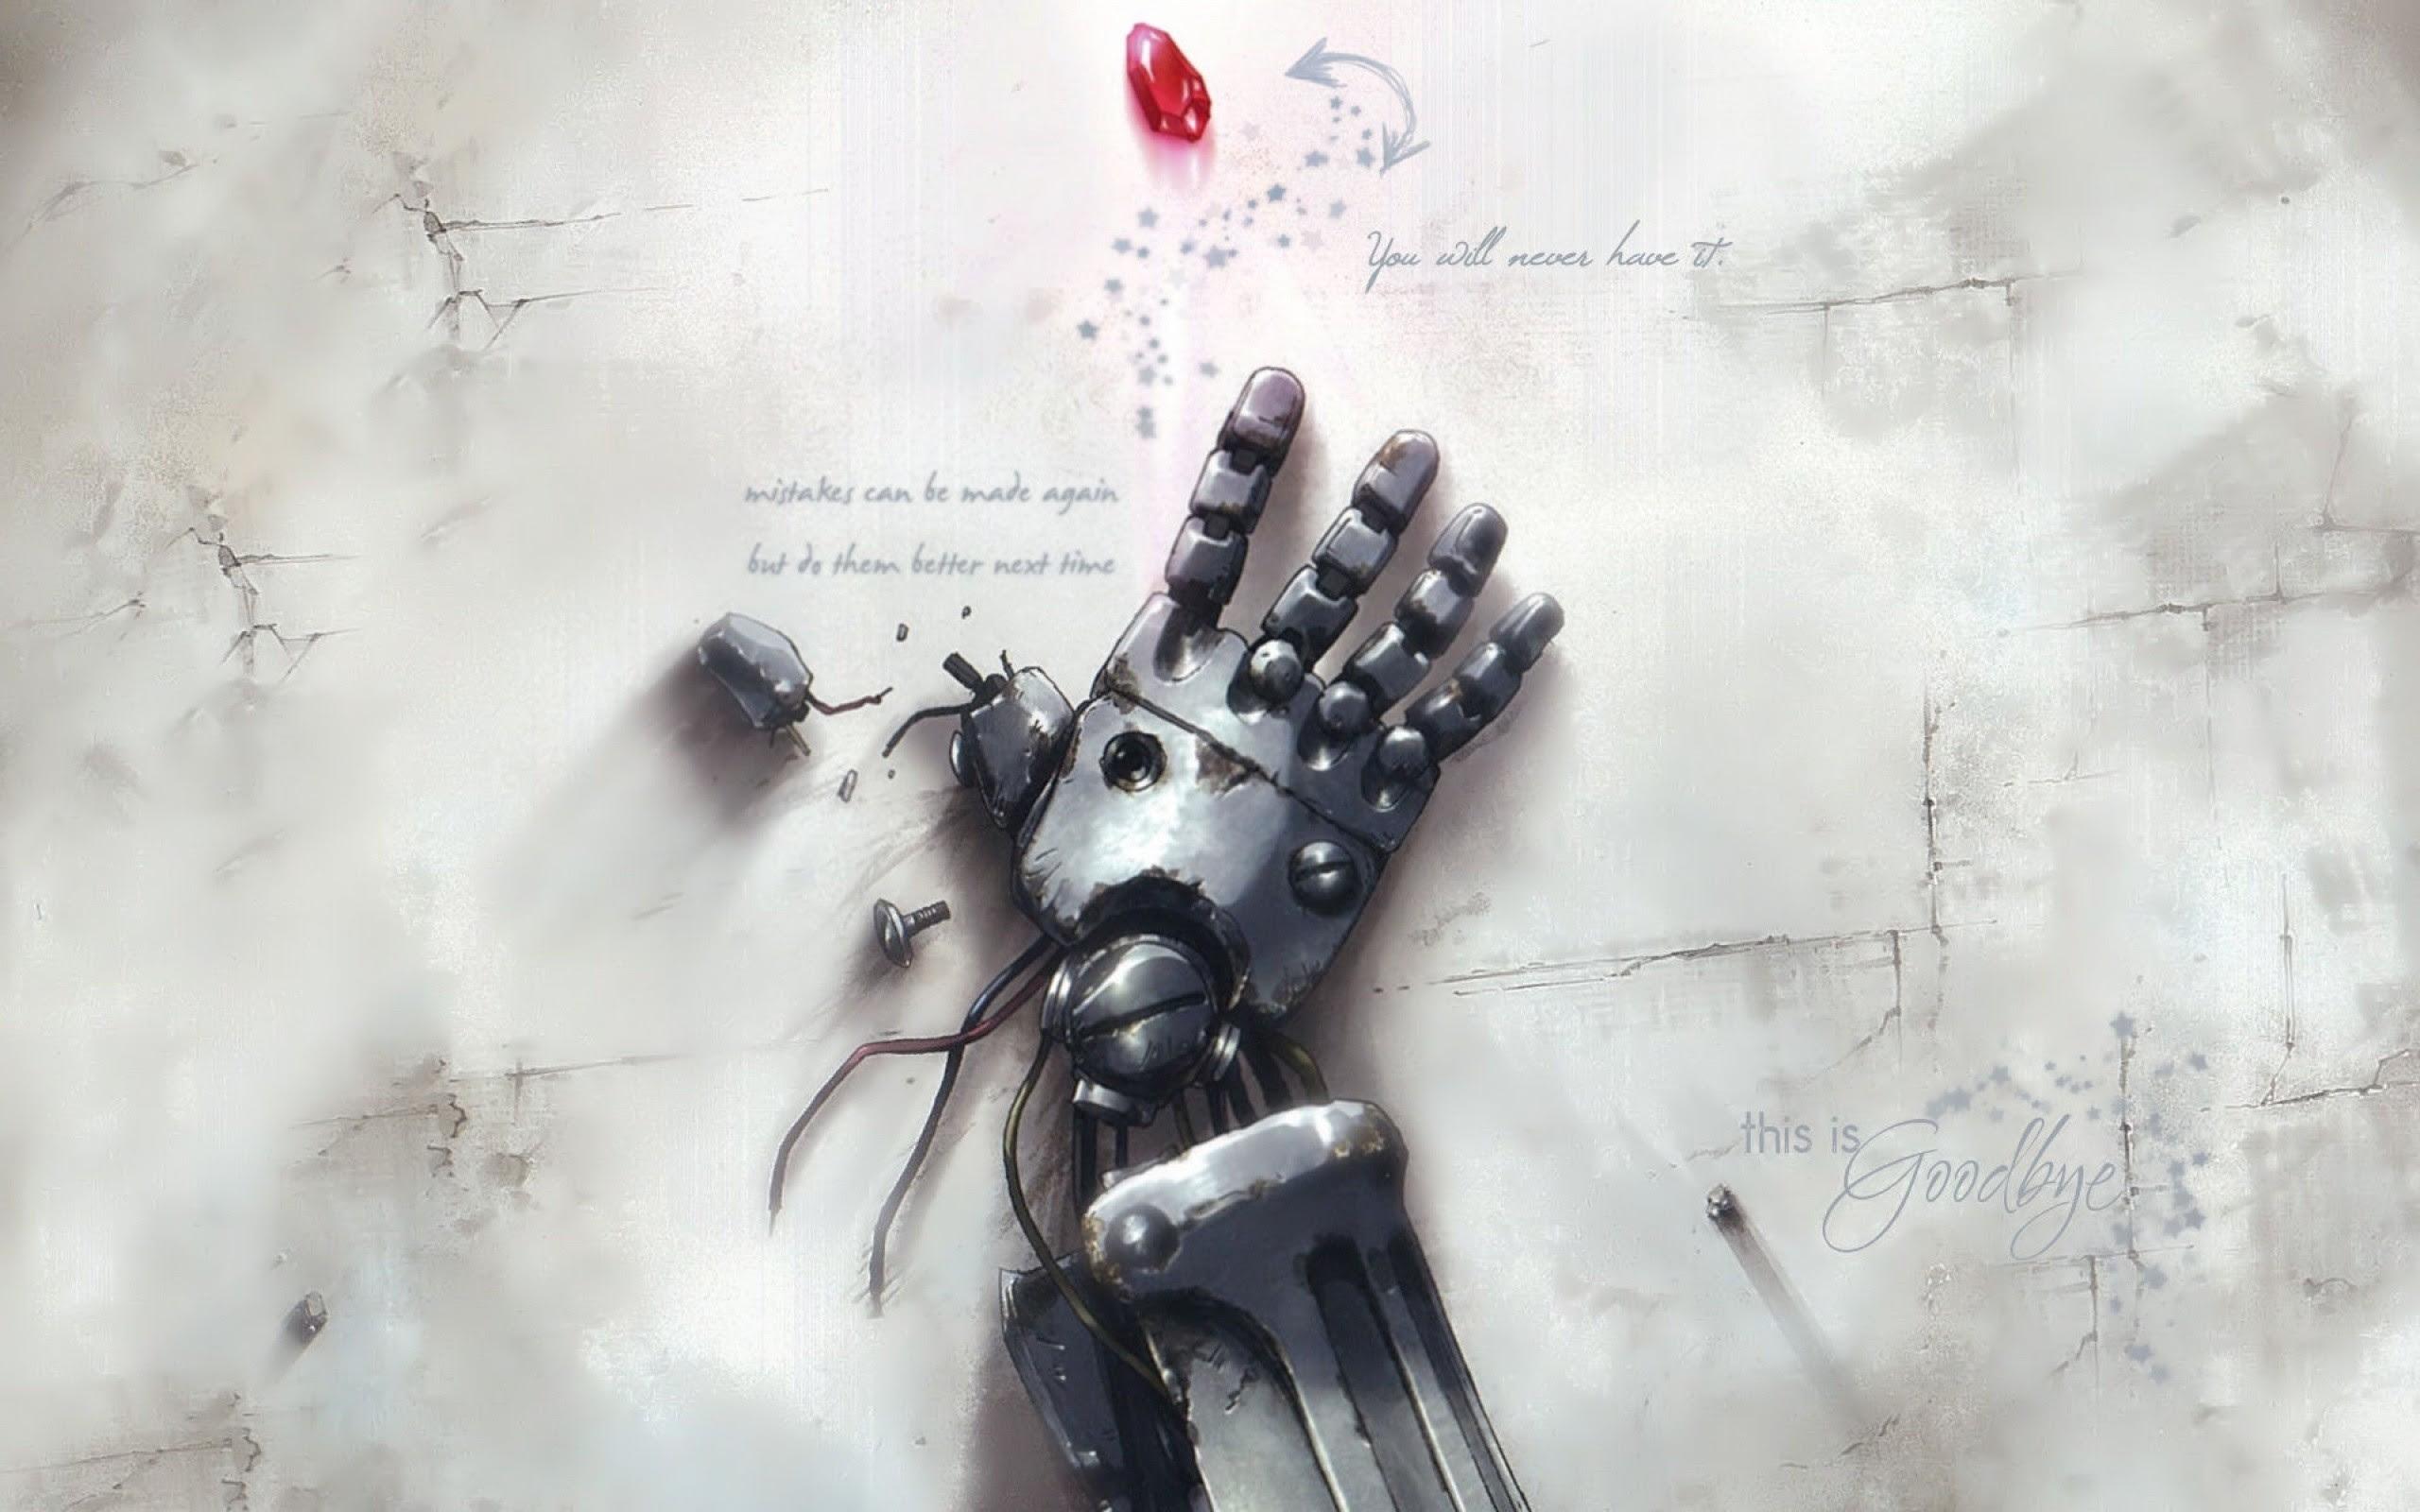 Fullmetal Alchemist Brotherhood Wallpaper Hd 68 Images